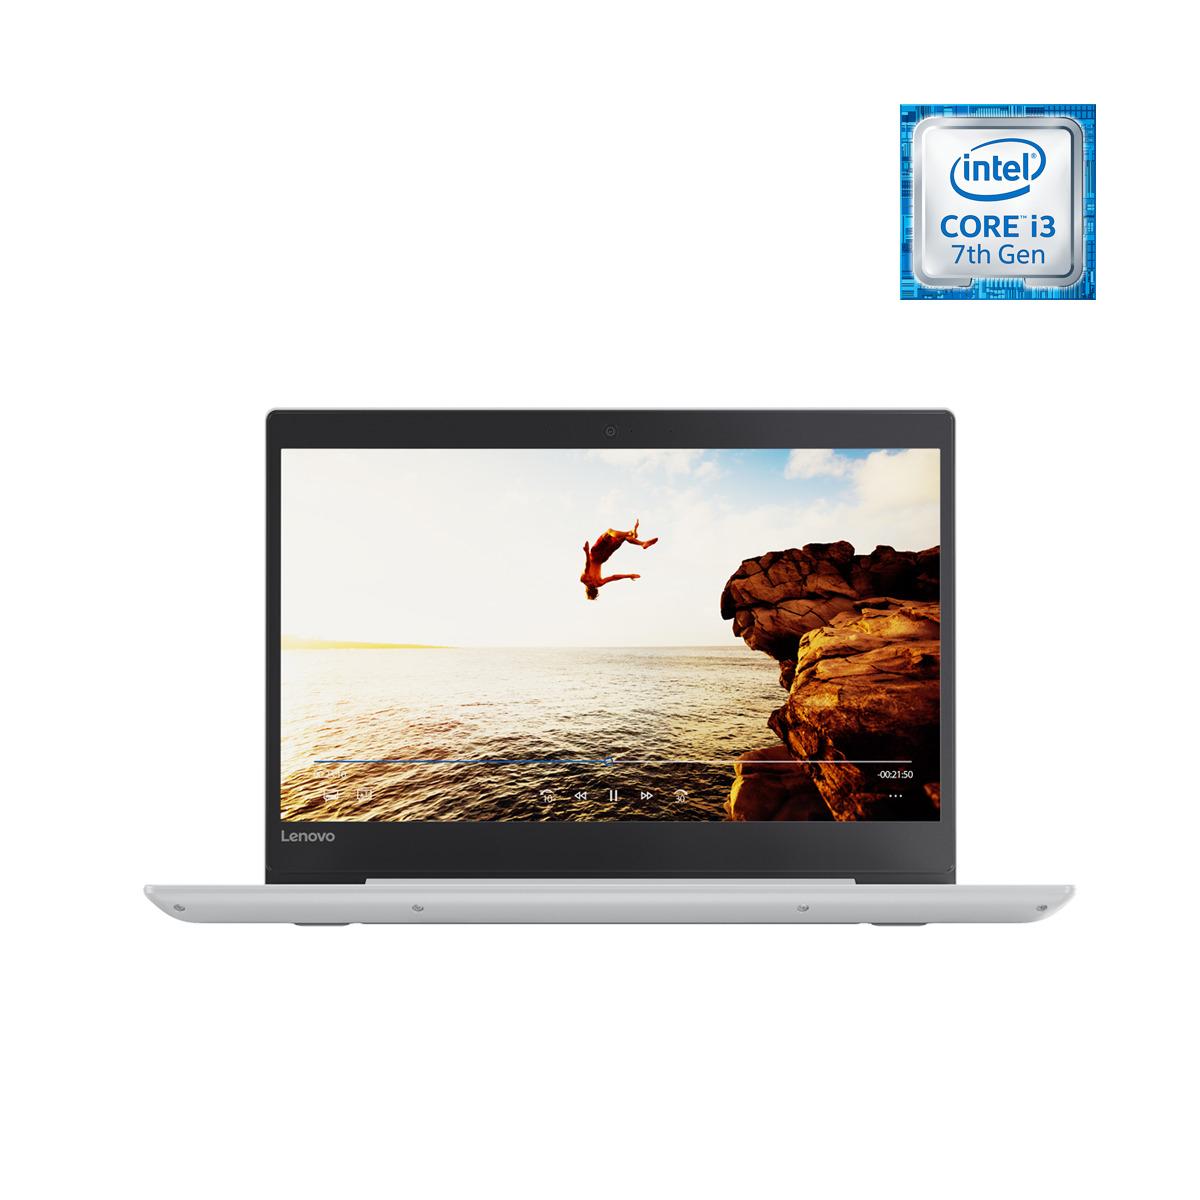 Portátil Lenovo Ideapad 320S-14 (Reacondicionado casi a estrenar), i3, 8 GB, 128 GB SSD, Blanco nieve